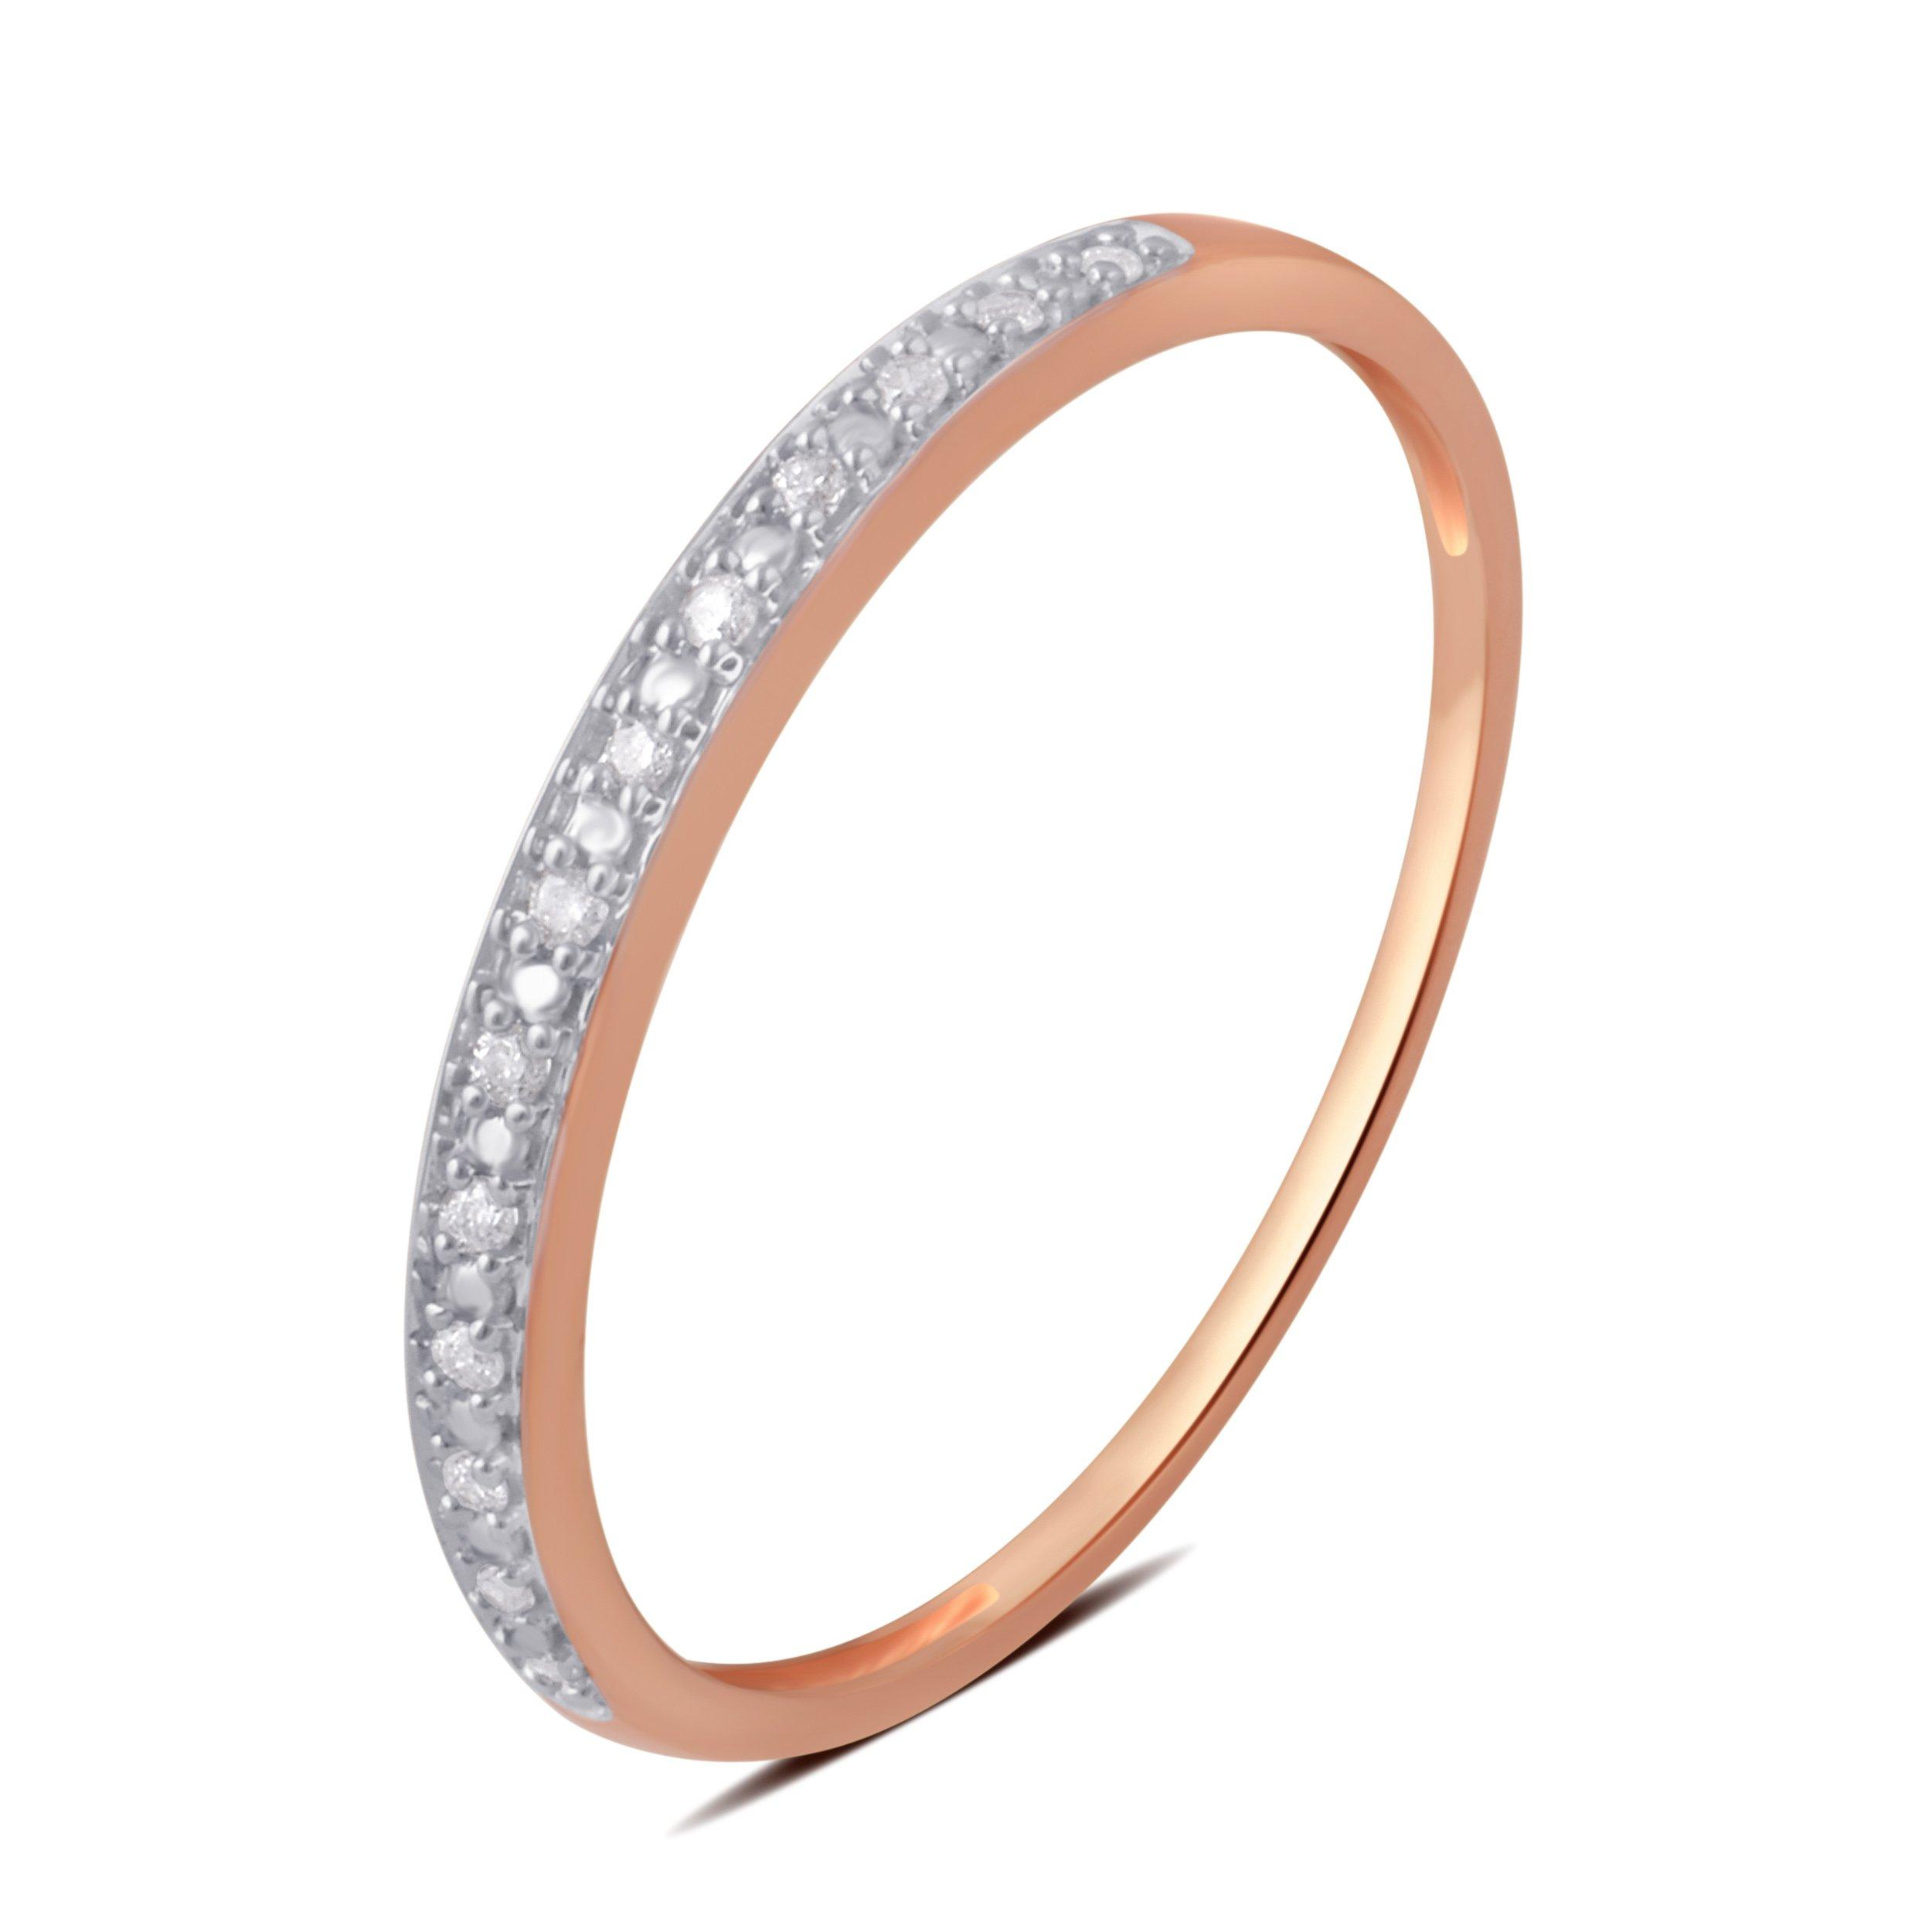 0.05 CTTW Round Diamond Wedding Band in 10K Rose Gold